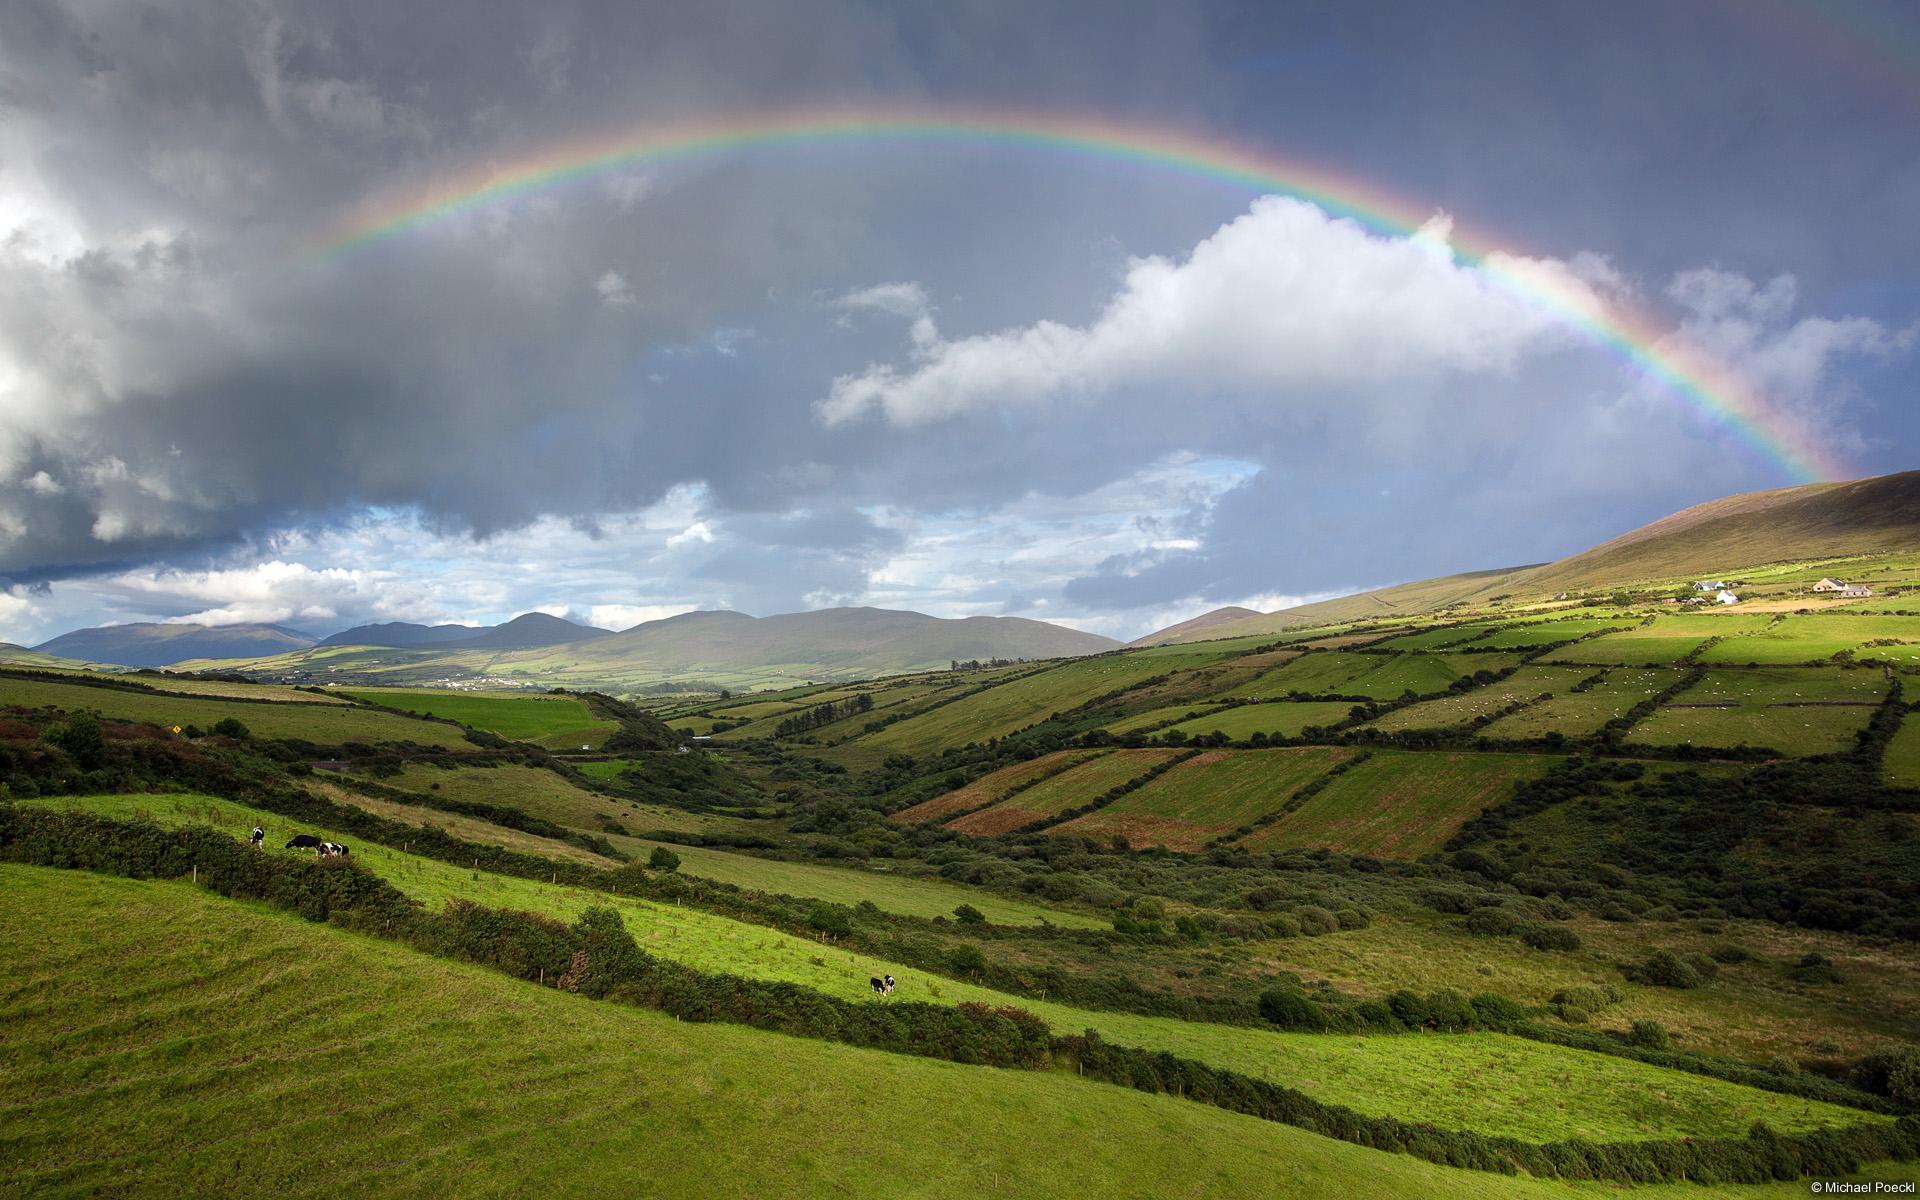 8122 northern ireland landscape wallpapers 1920x1200